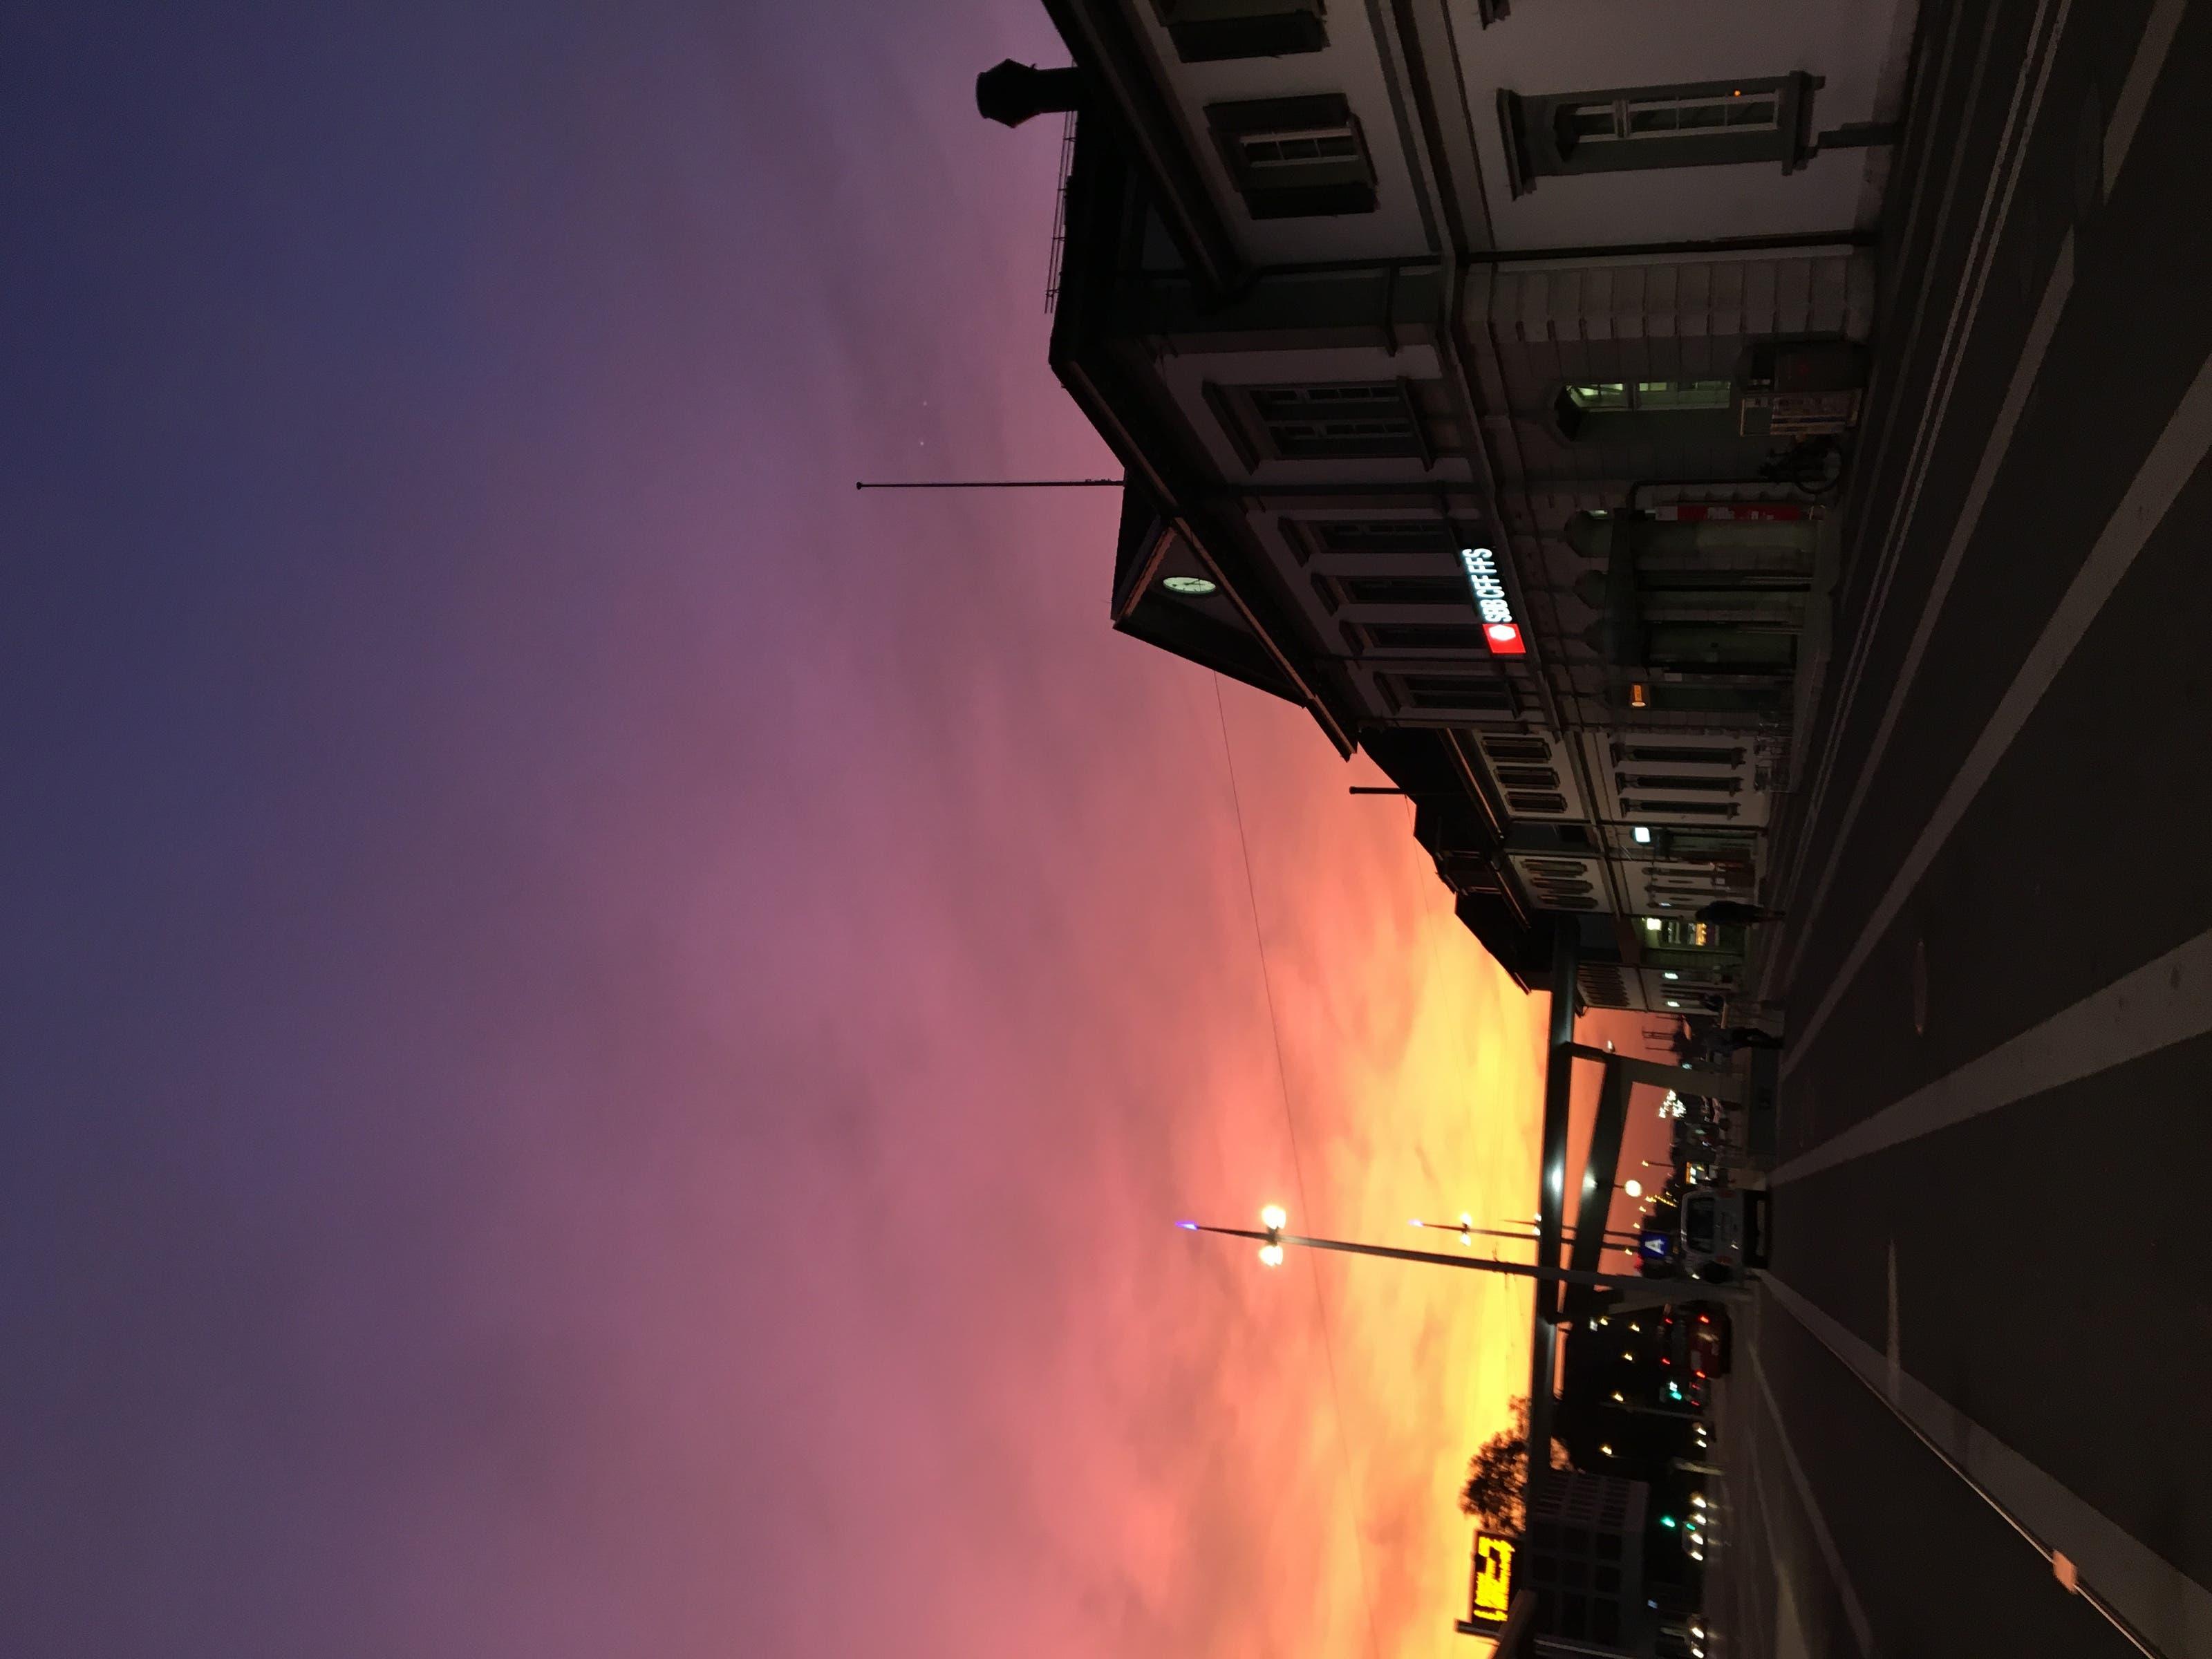 undefined Früh am Morgen am Solothurner Hauptbahnhof